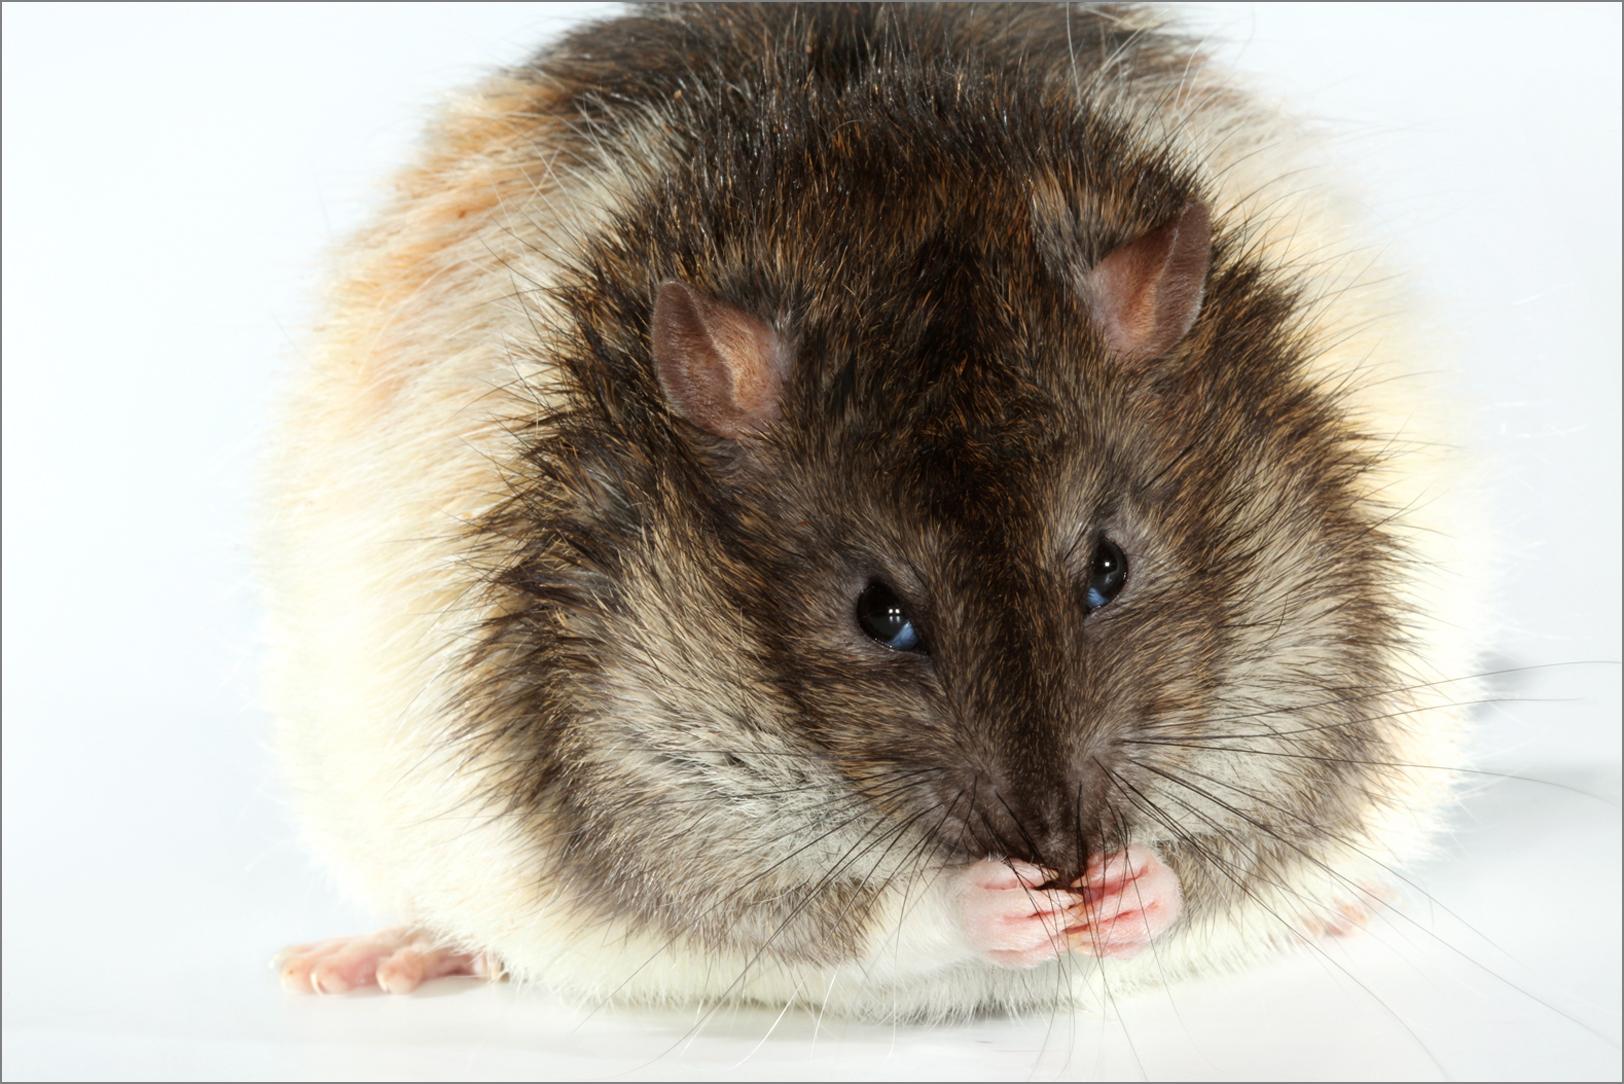 OBESE RAT